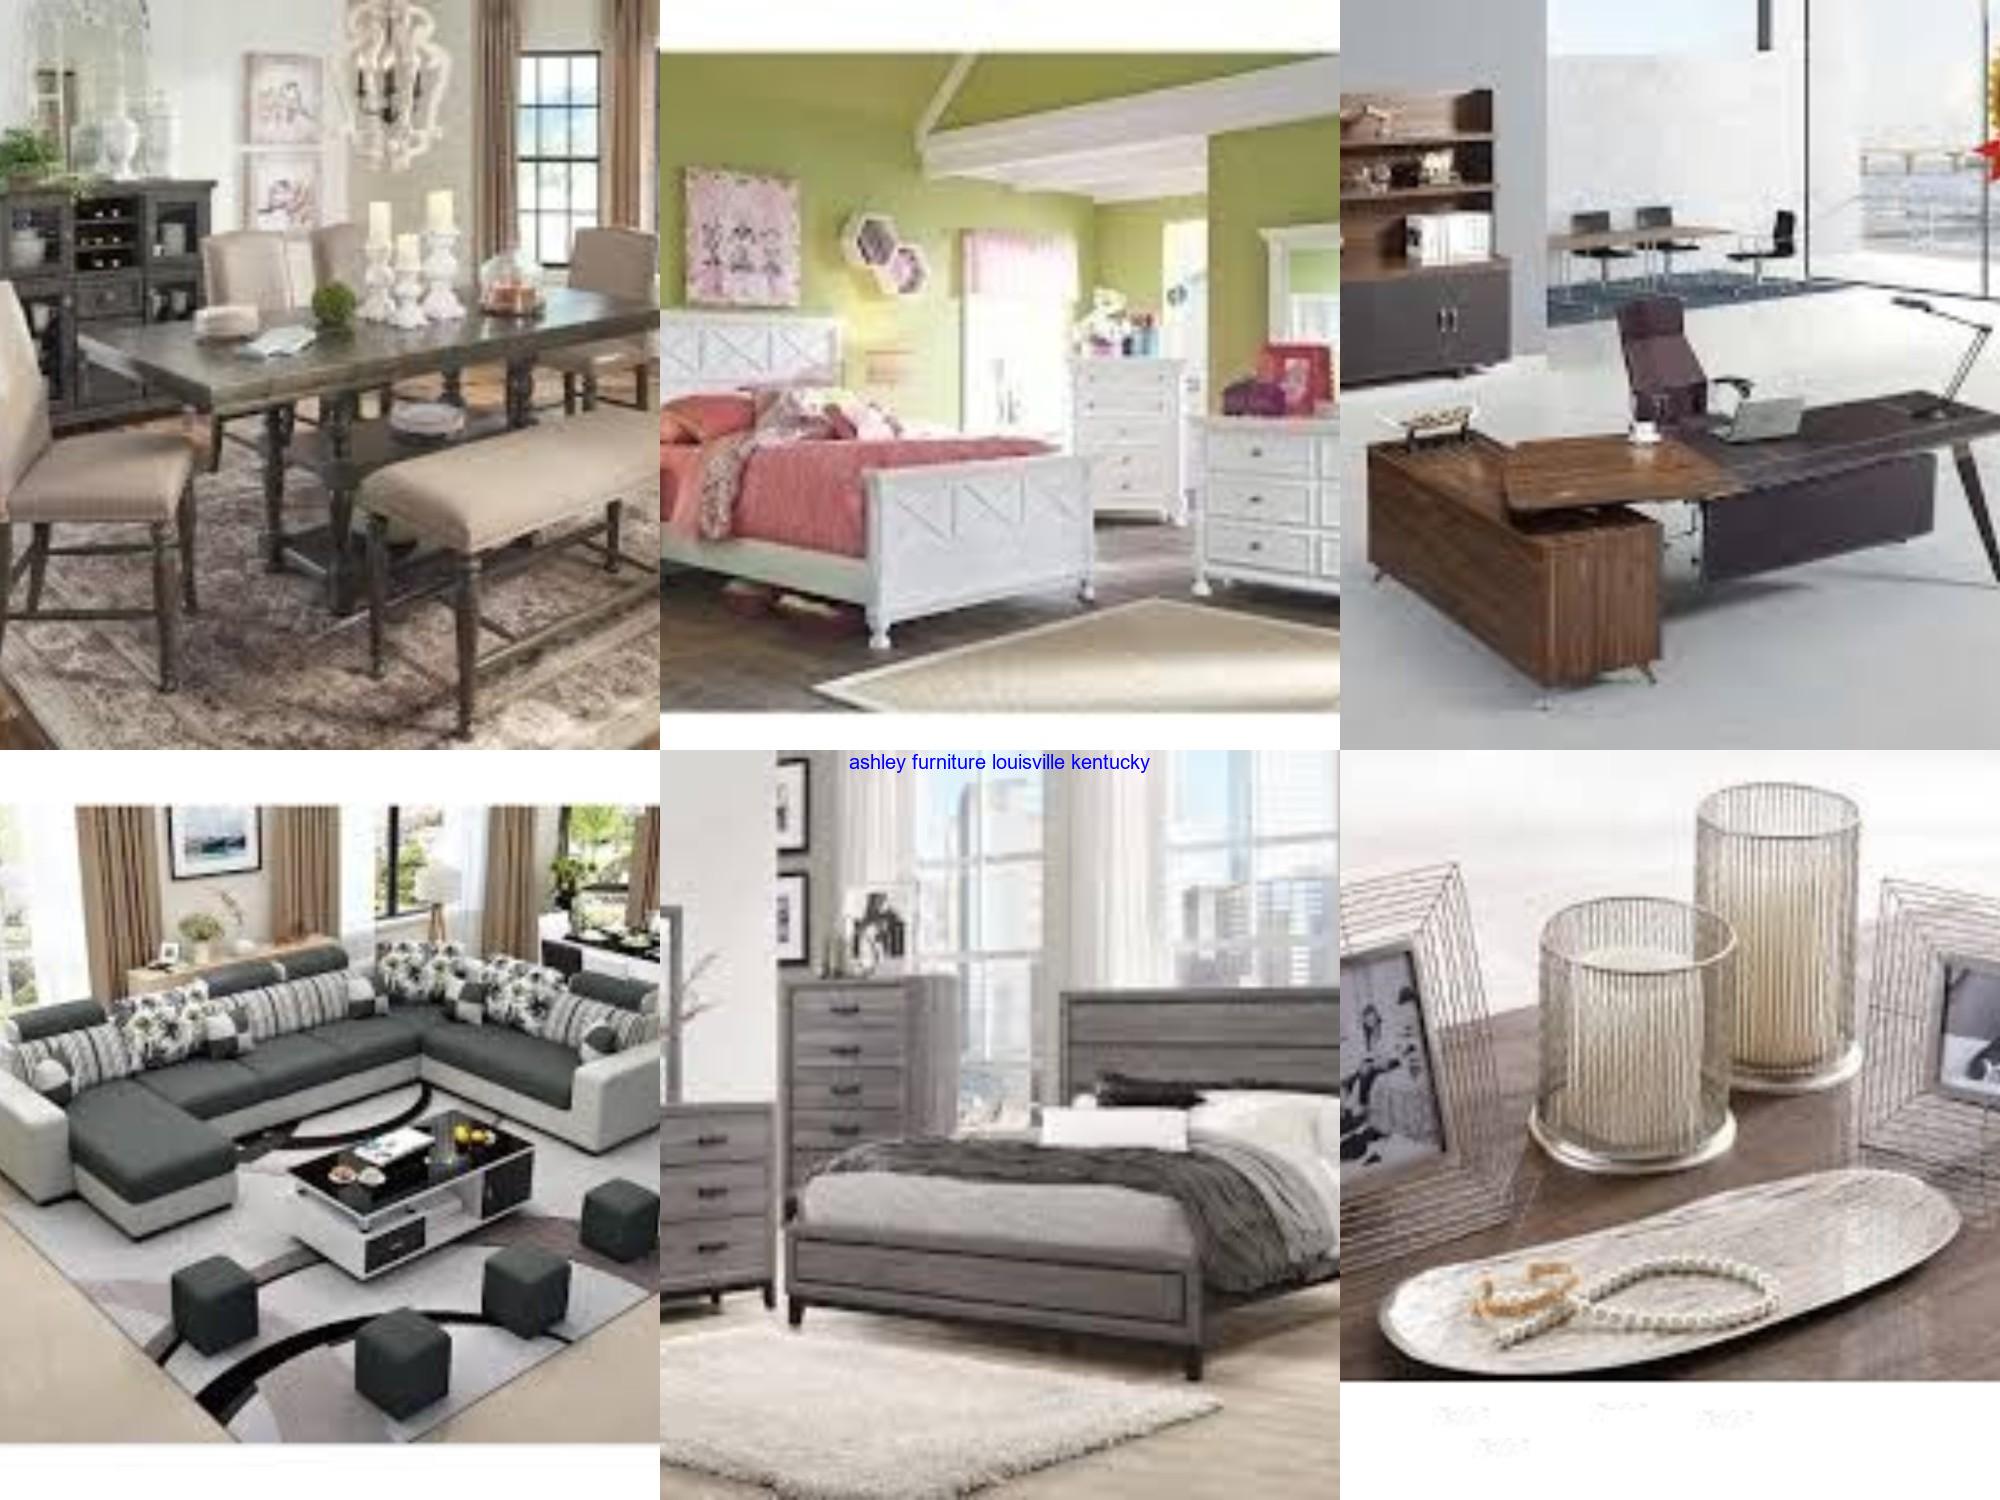 Ashley Furniture Louisville Kentucky Furniture Prices Wholesale Furniture Furniture